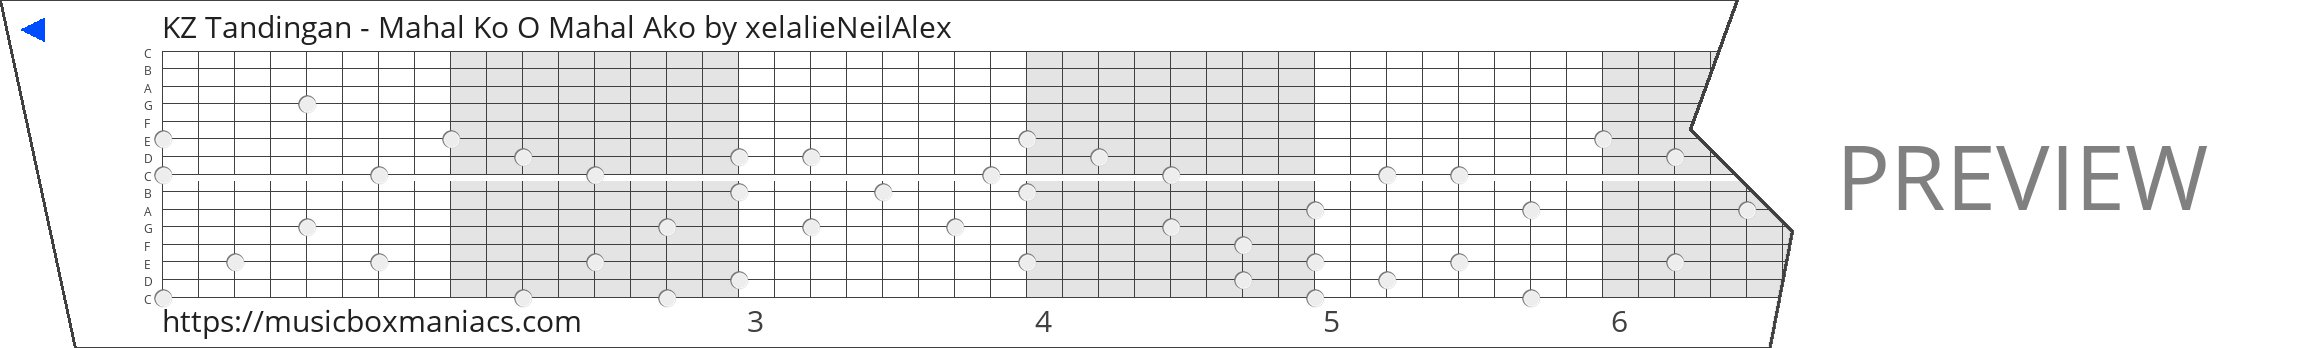 KZ Tandingan - Mahal Ko O Mahal Ako 15 note music box paper strip